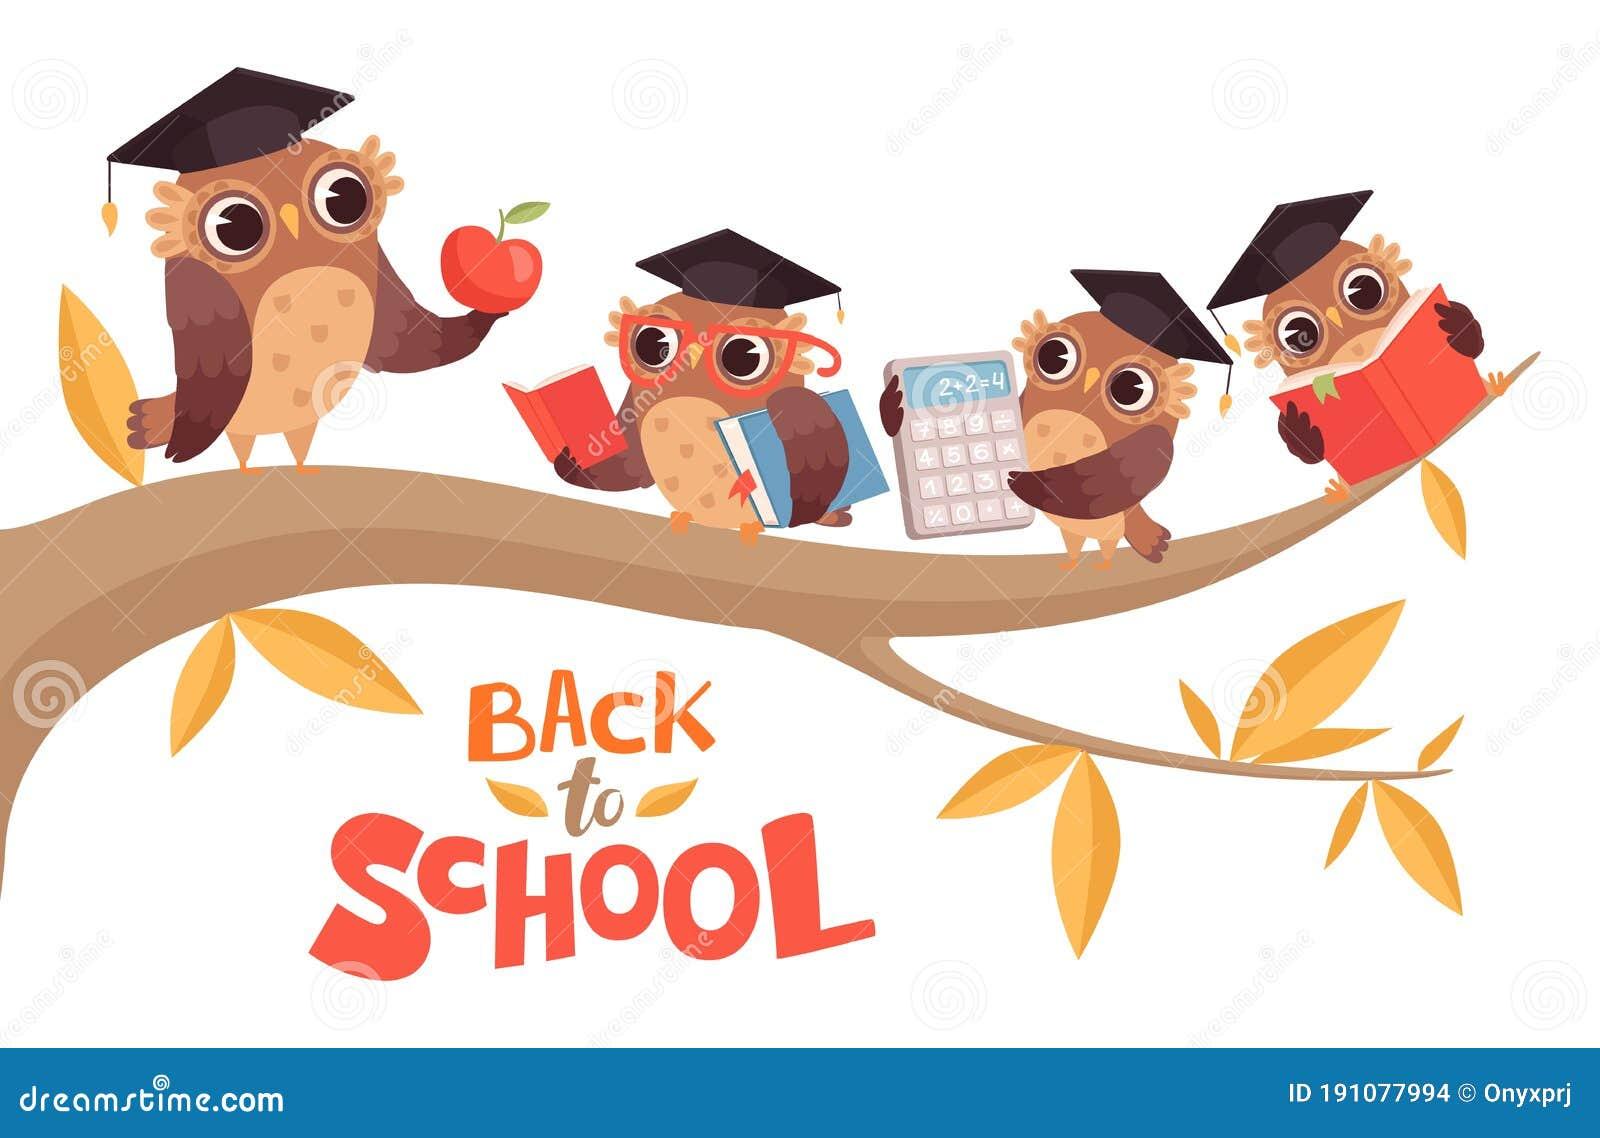 Cartoon Cute Animal Teacher Stock Illustrations 2 578 Cartoon Cute Animal Teacher Stock Illustrations Vectors Clipart Dreamstime